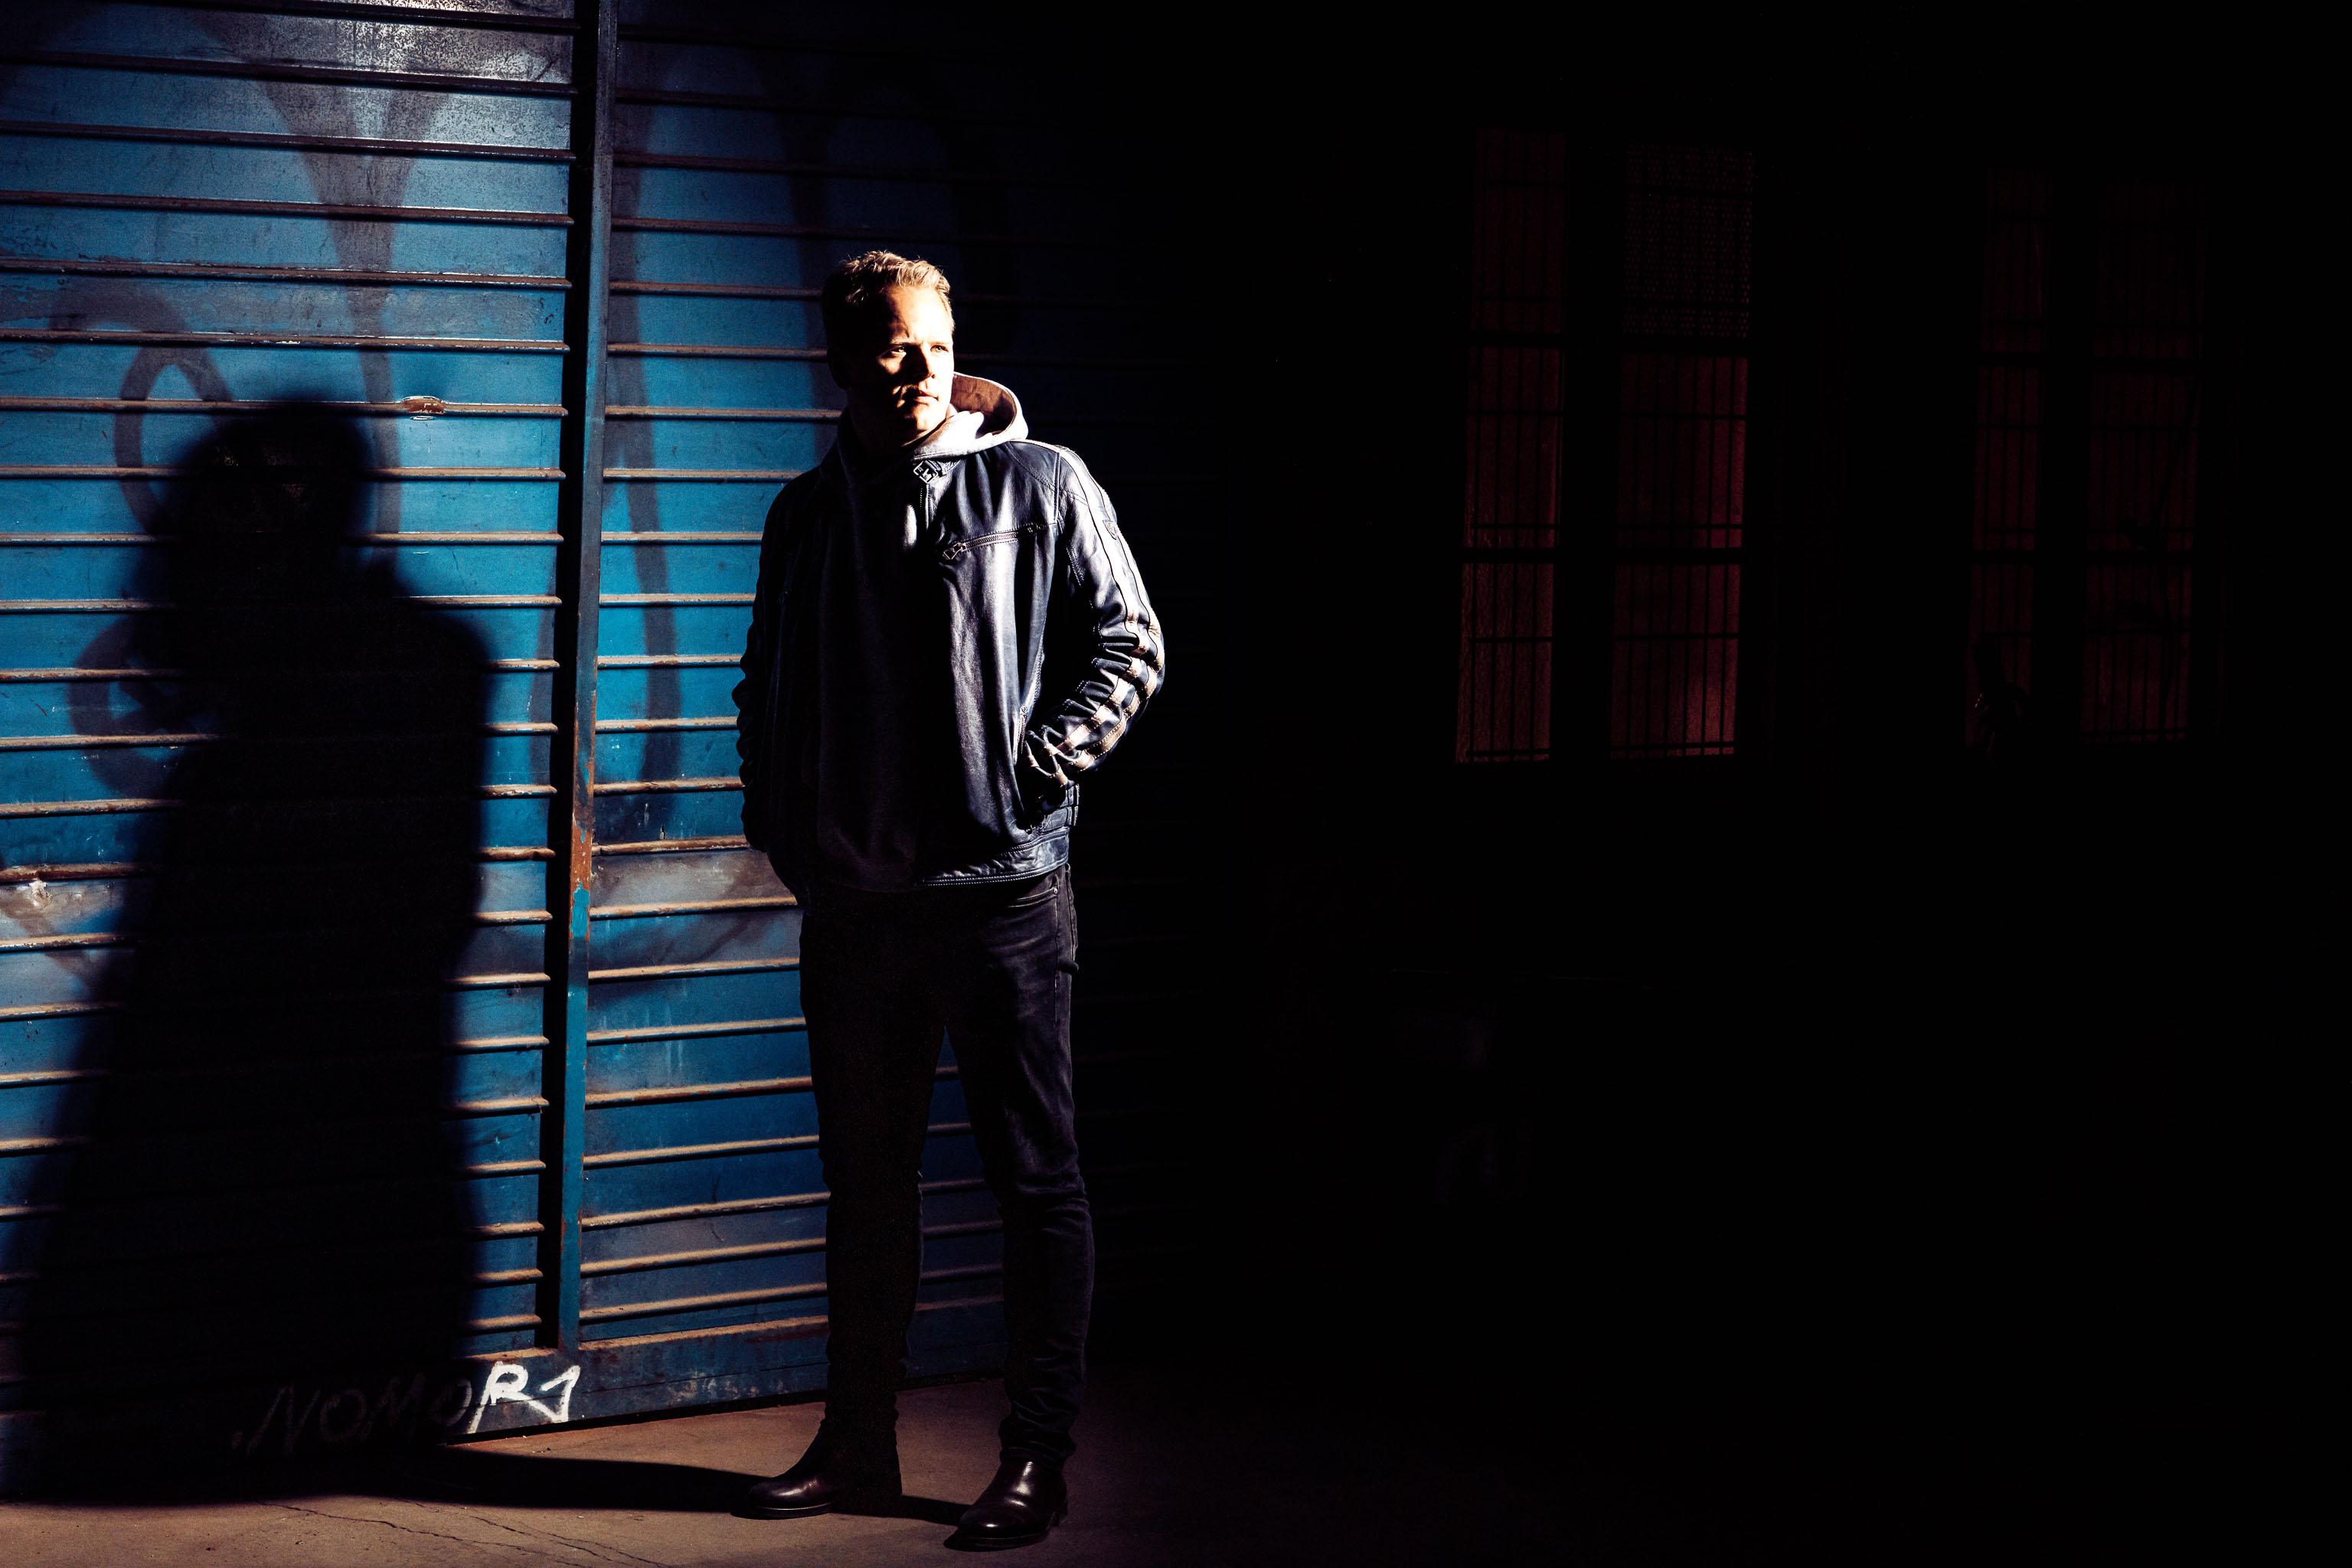 Sven-Michael---Late-@the-Station----5---©-Sven-Michael-Golimowski.jpg